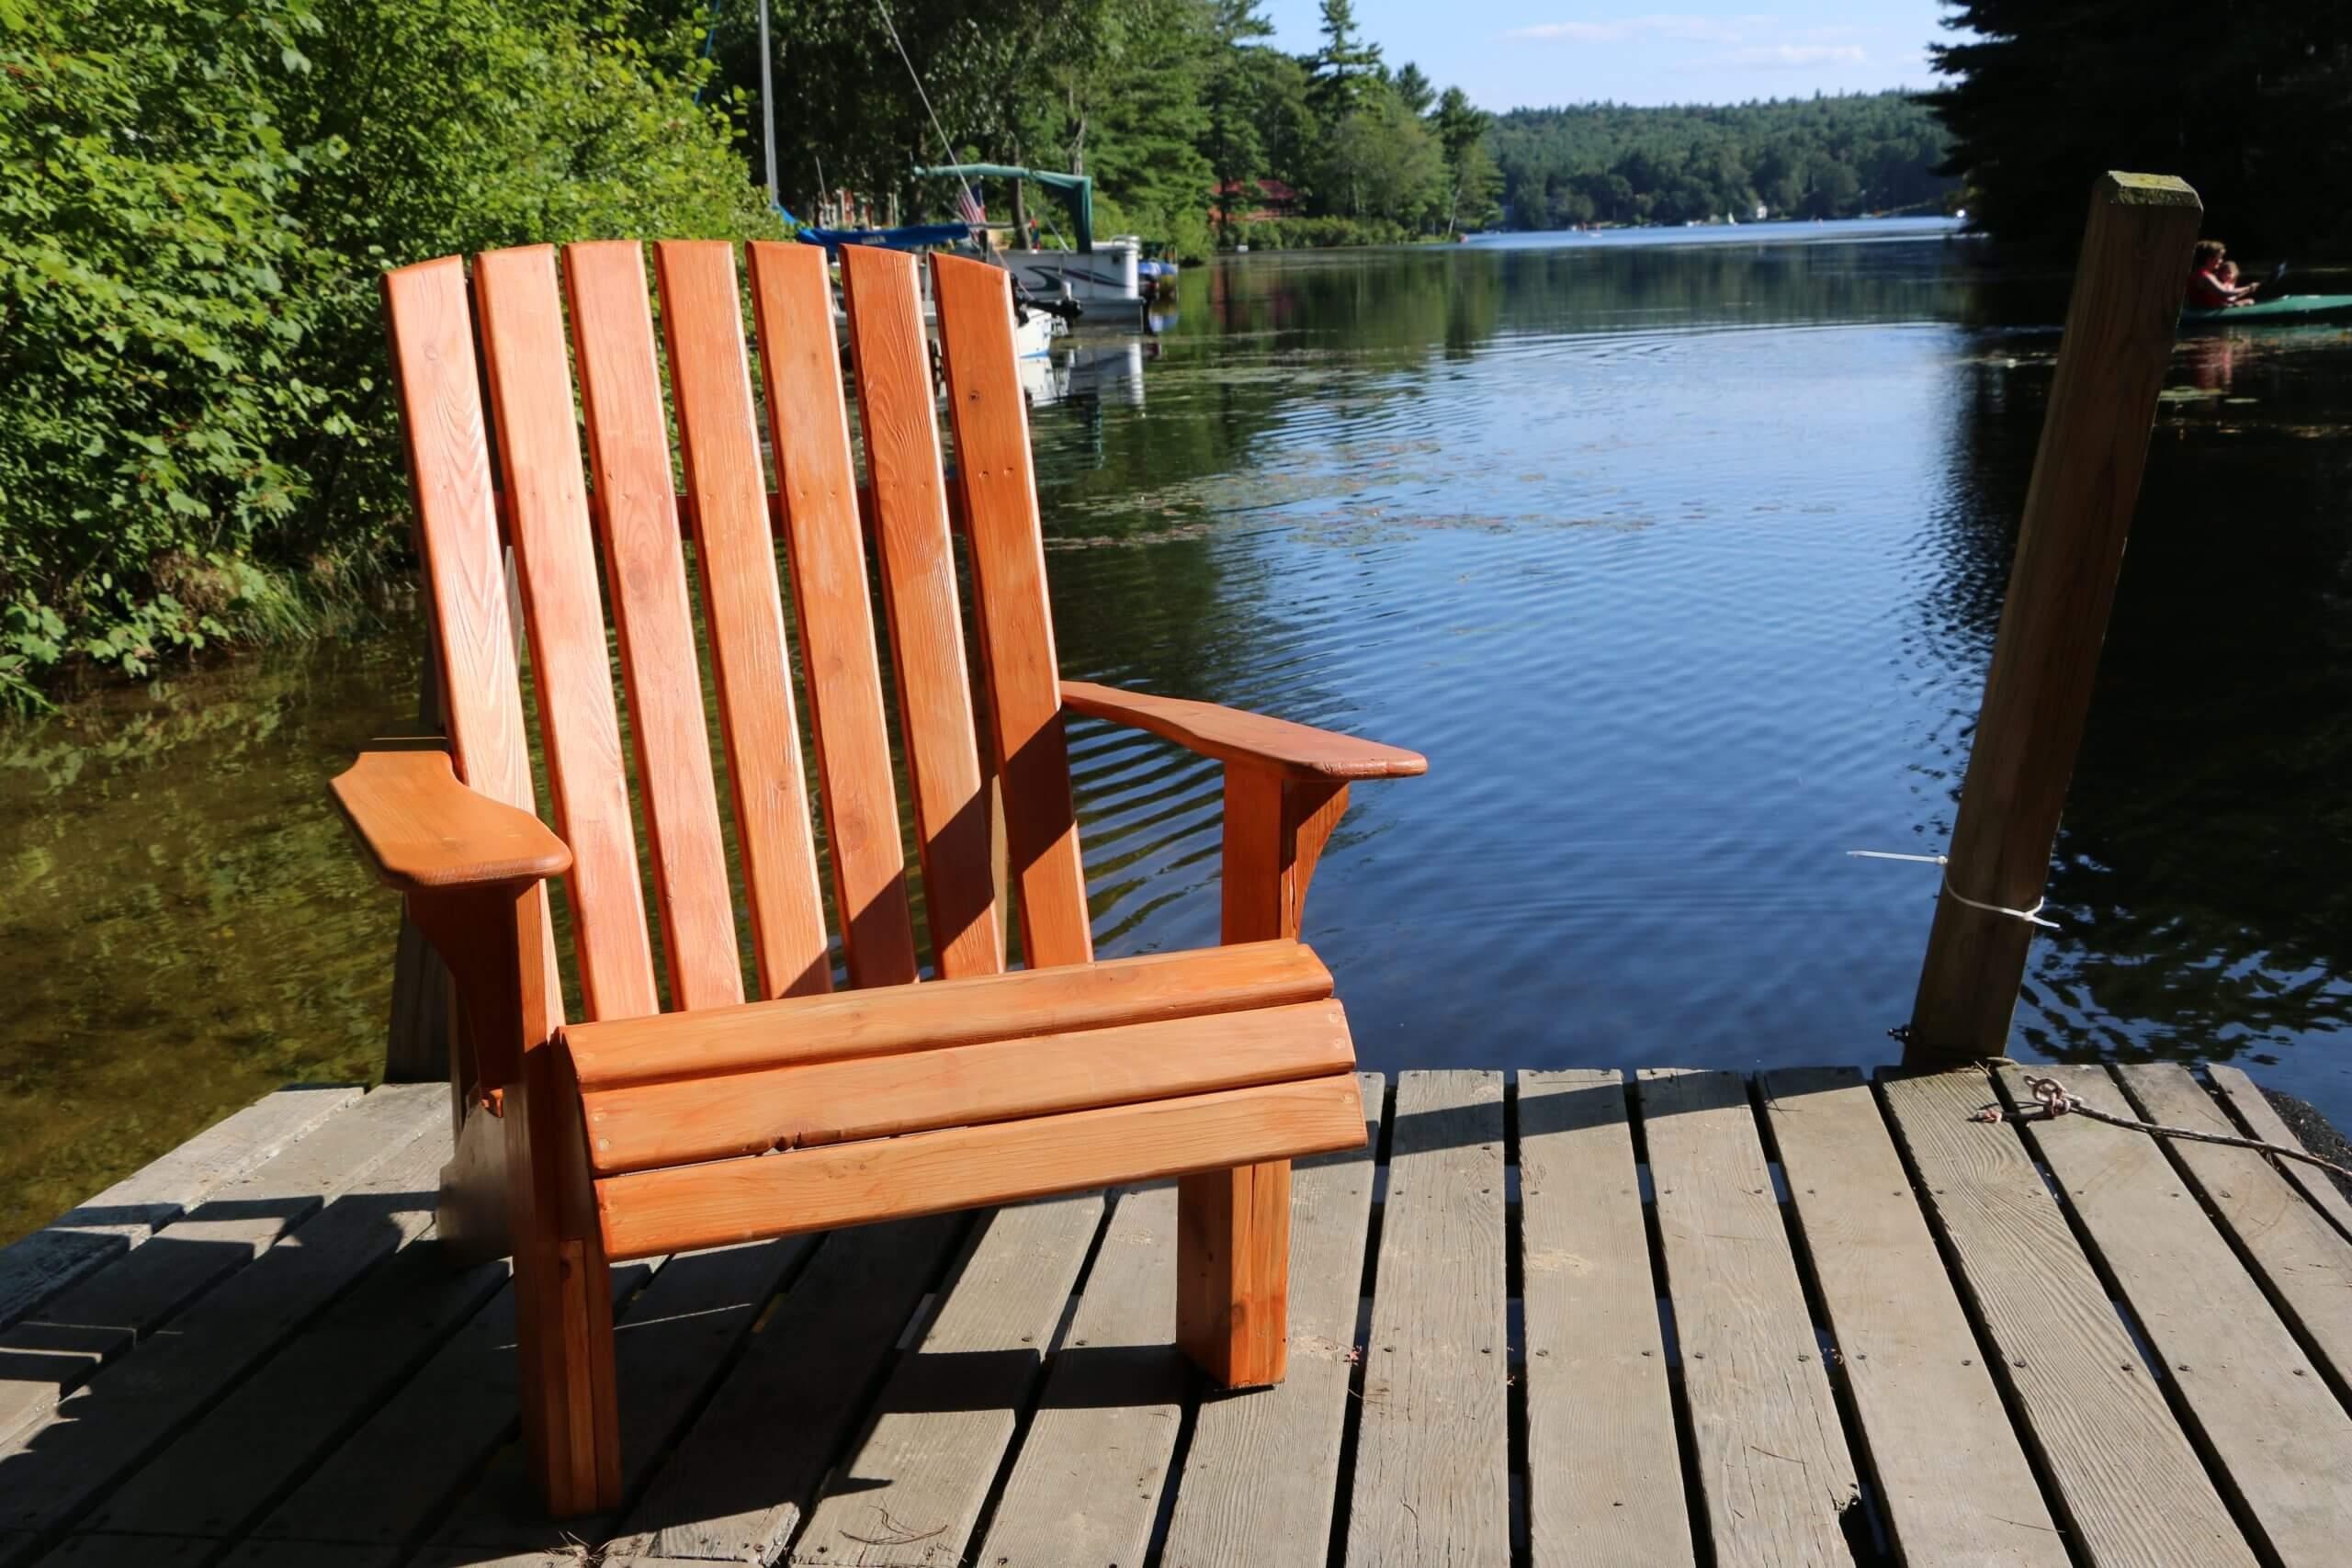 How to build Adirondack chairs